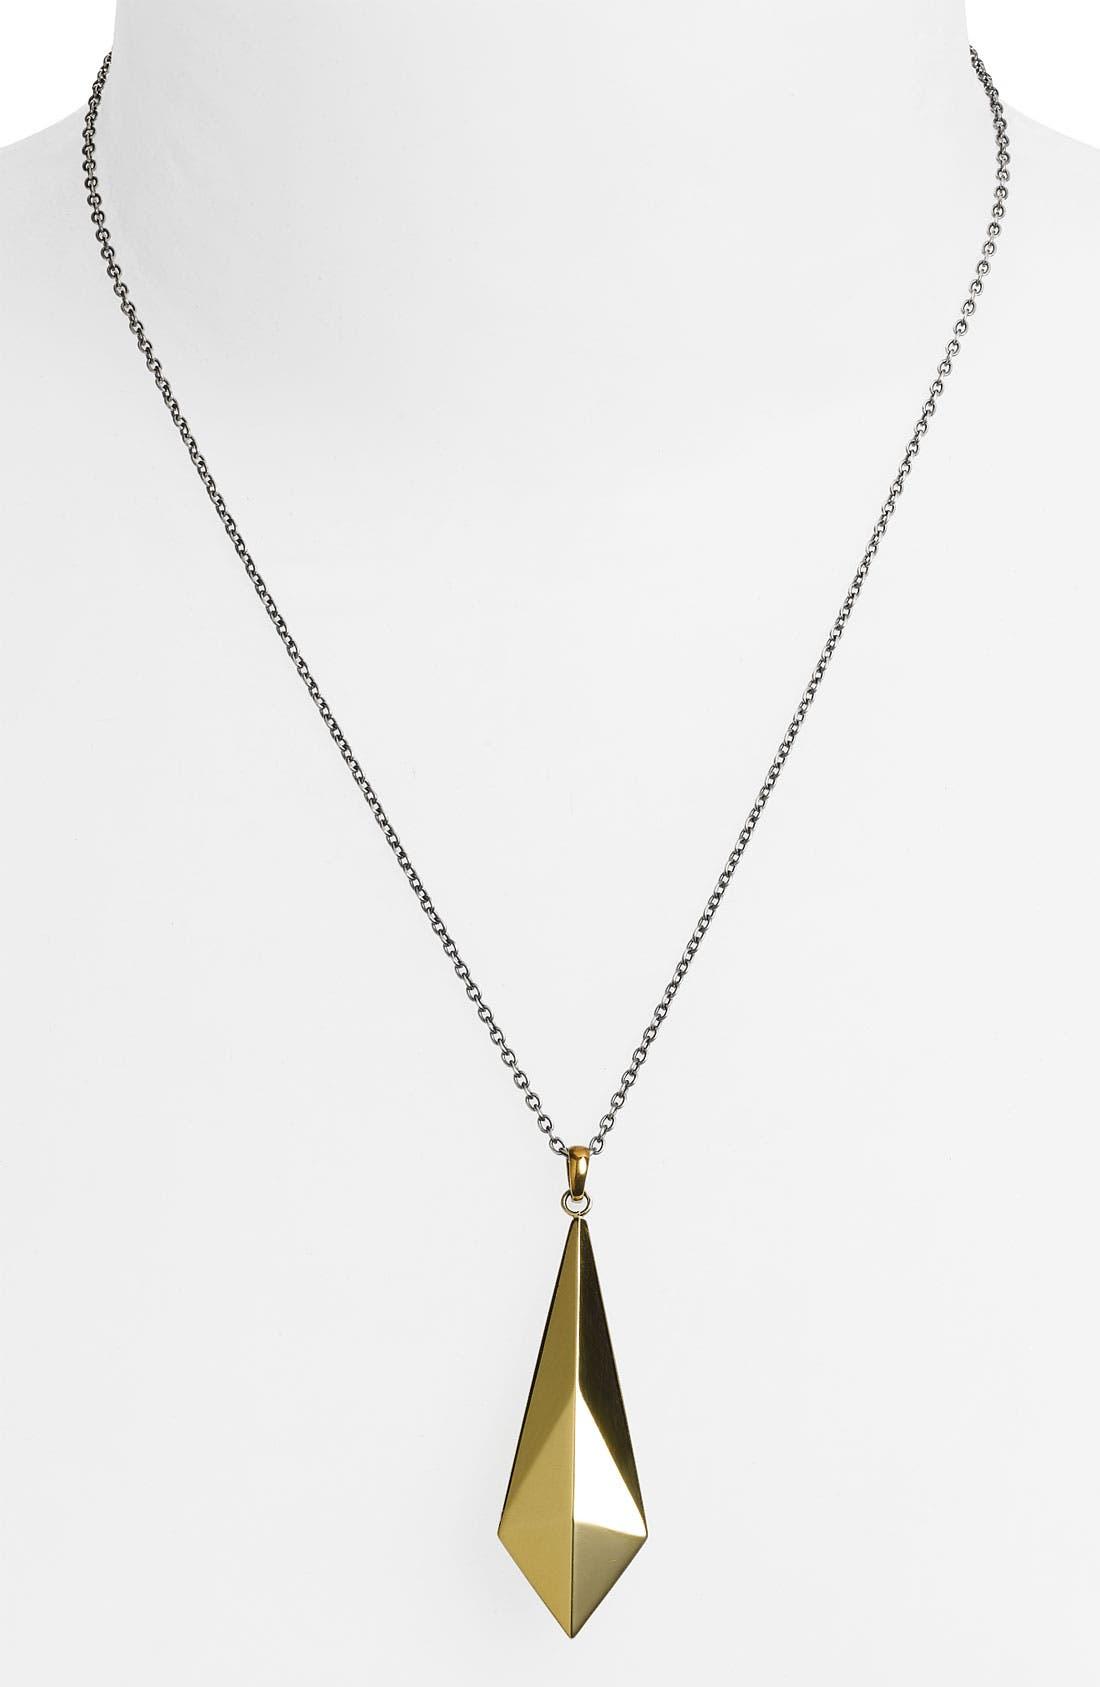 Main Image - Elizabeth and James 'Geodesic' Pendant Necklace